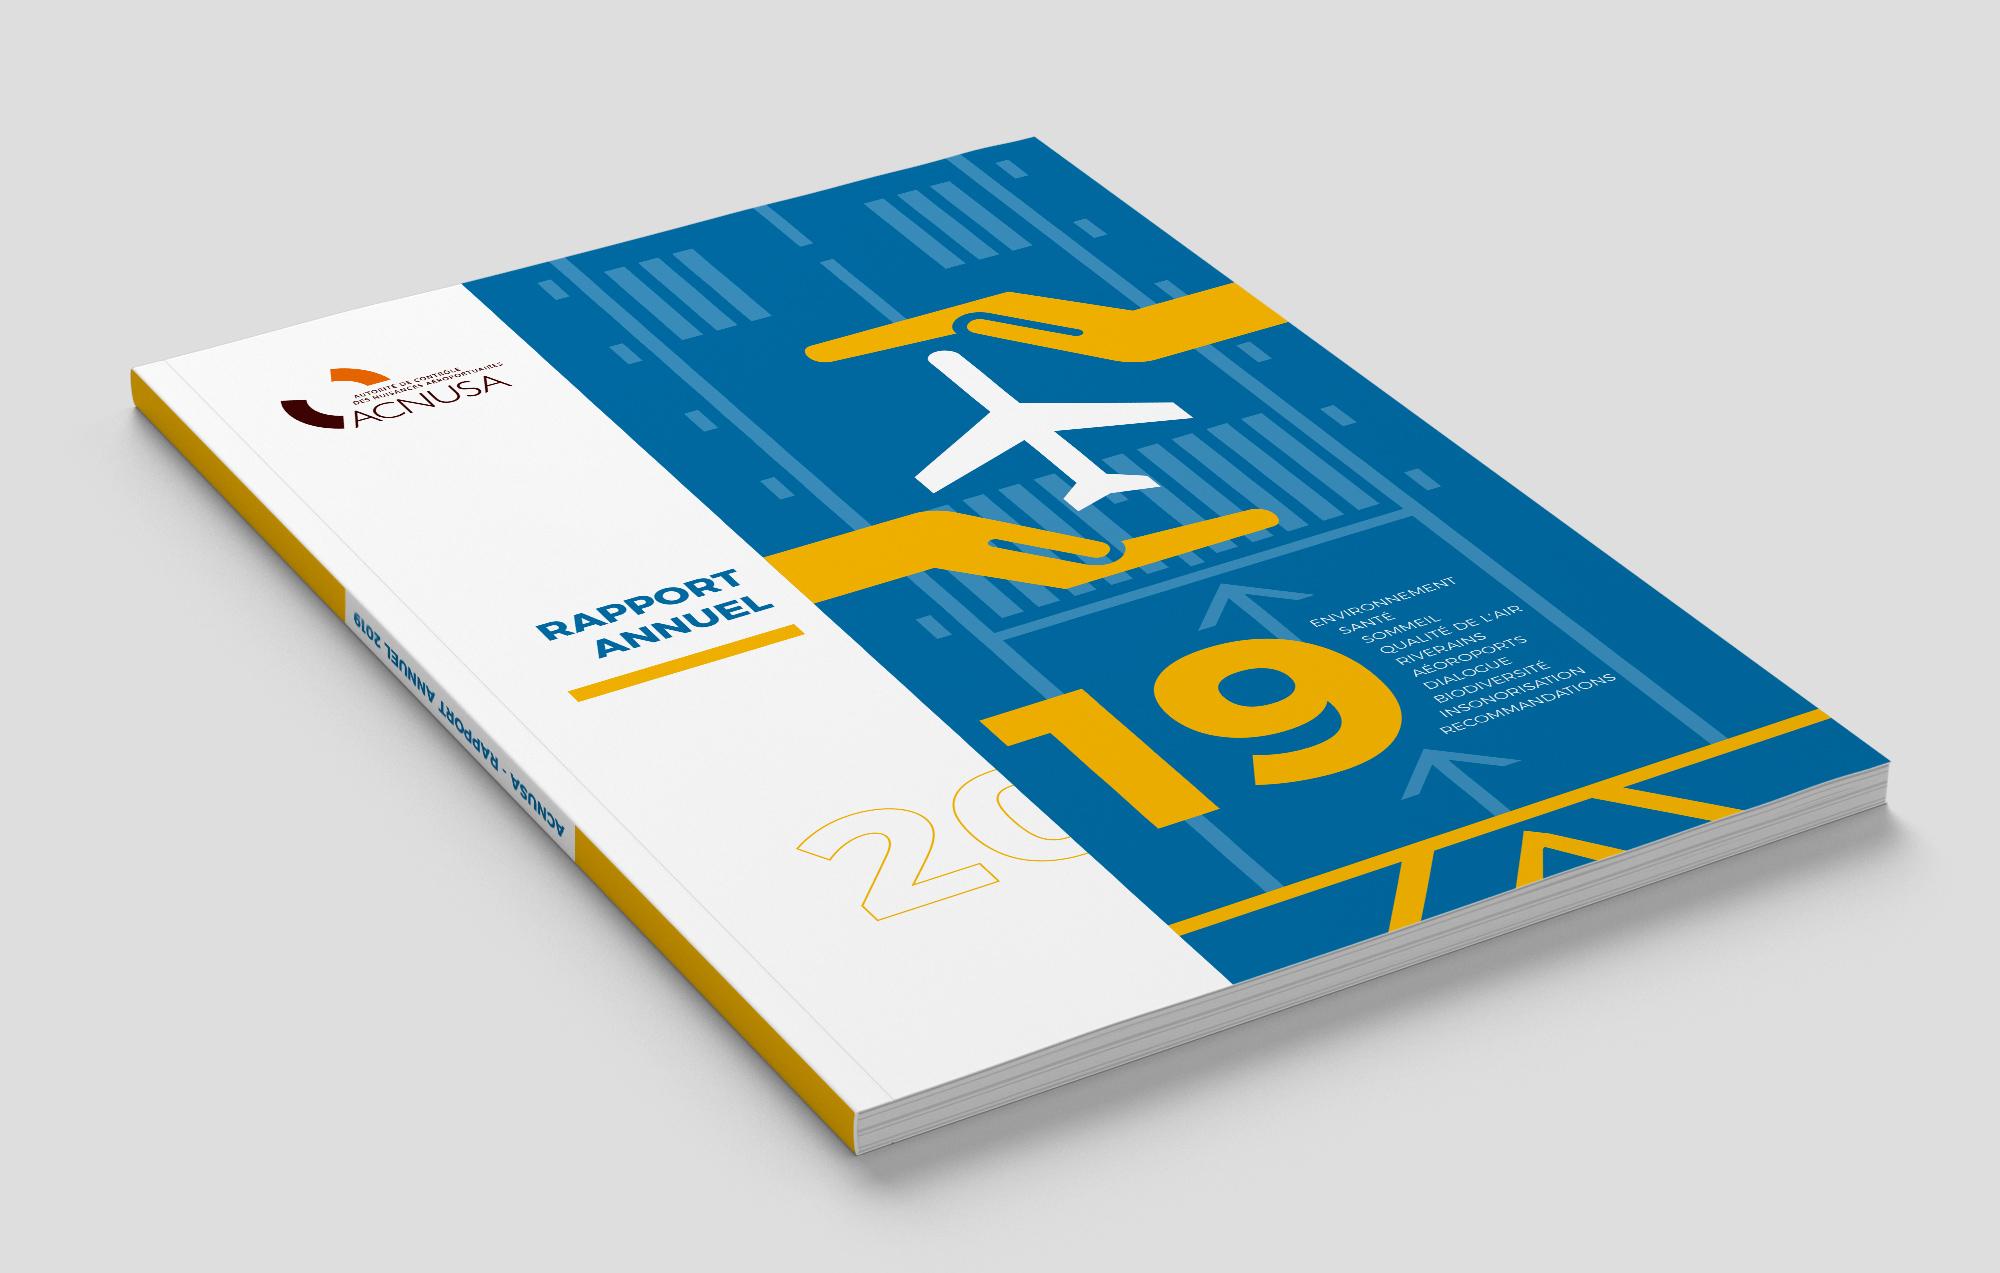 ACNUSA-Rapport-annuel-2019-conception-wala-studio-graphique4